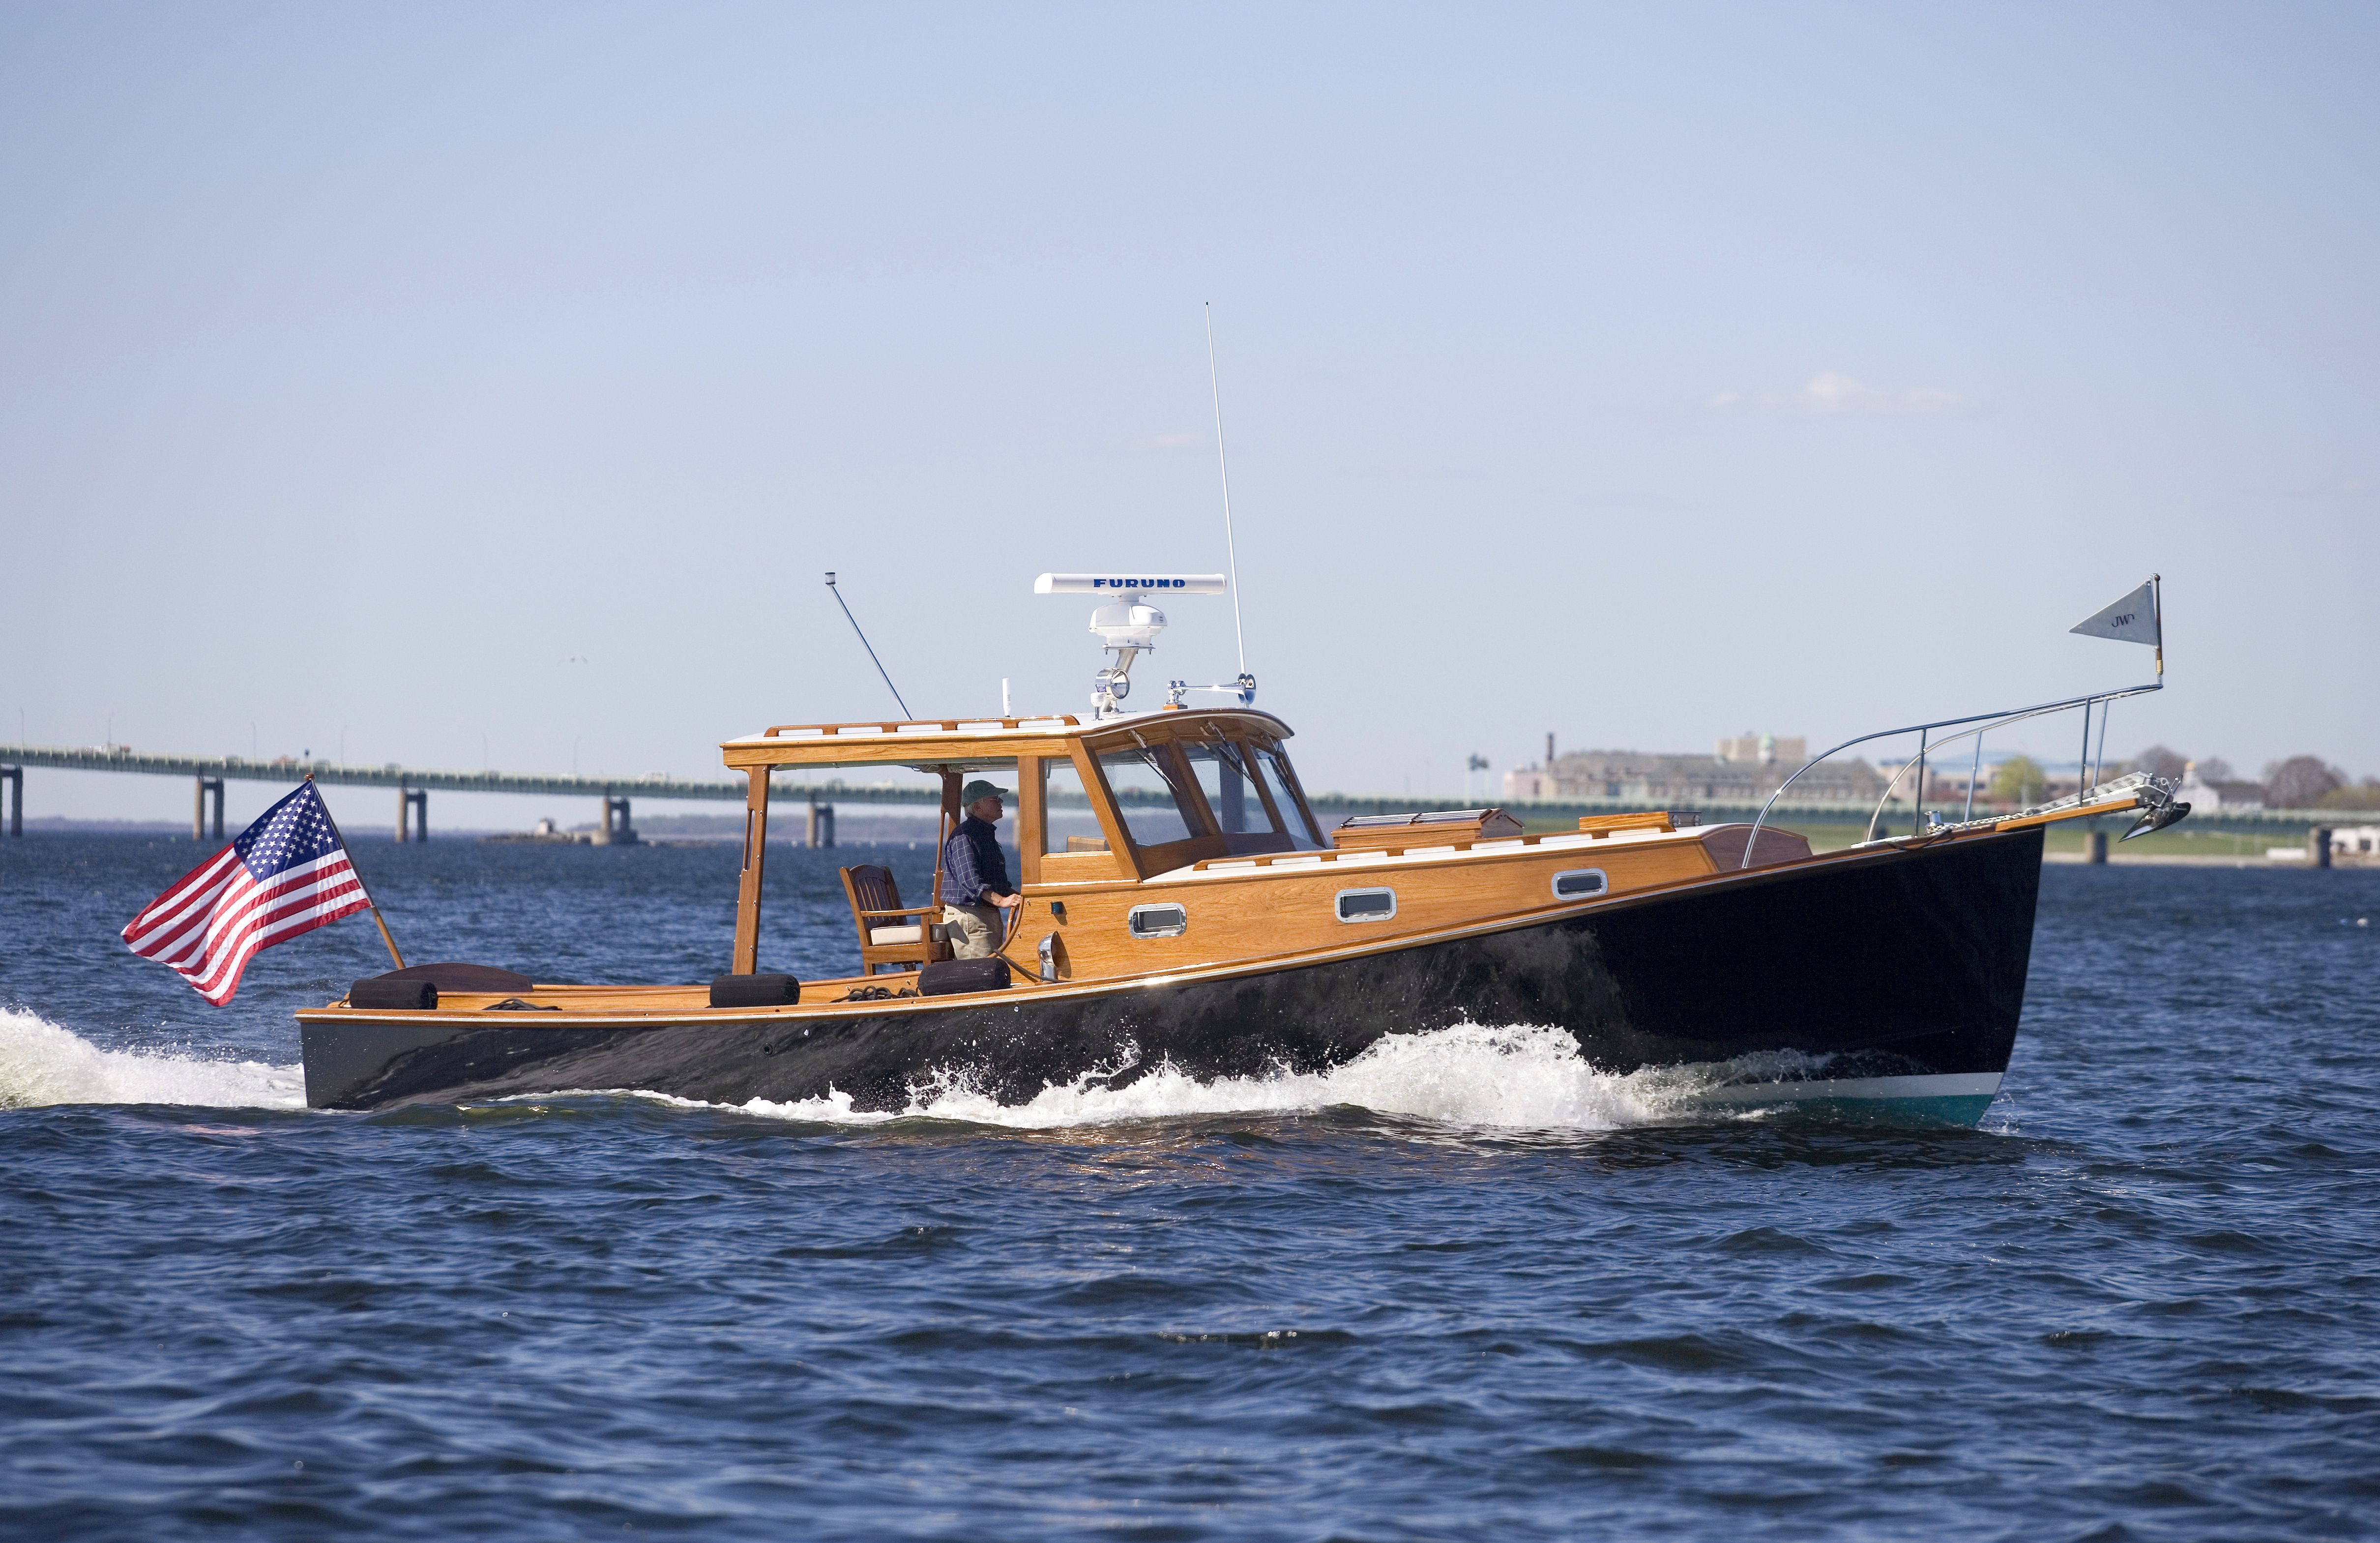 Boats yachts maine boats lobster boats picnic boats sailing - The Stanley 36 John Williams Boat Company